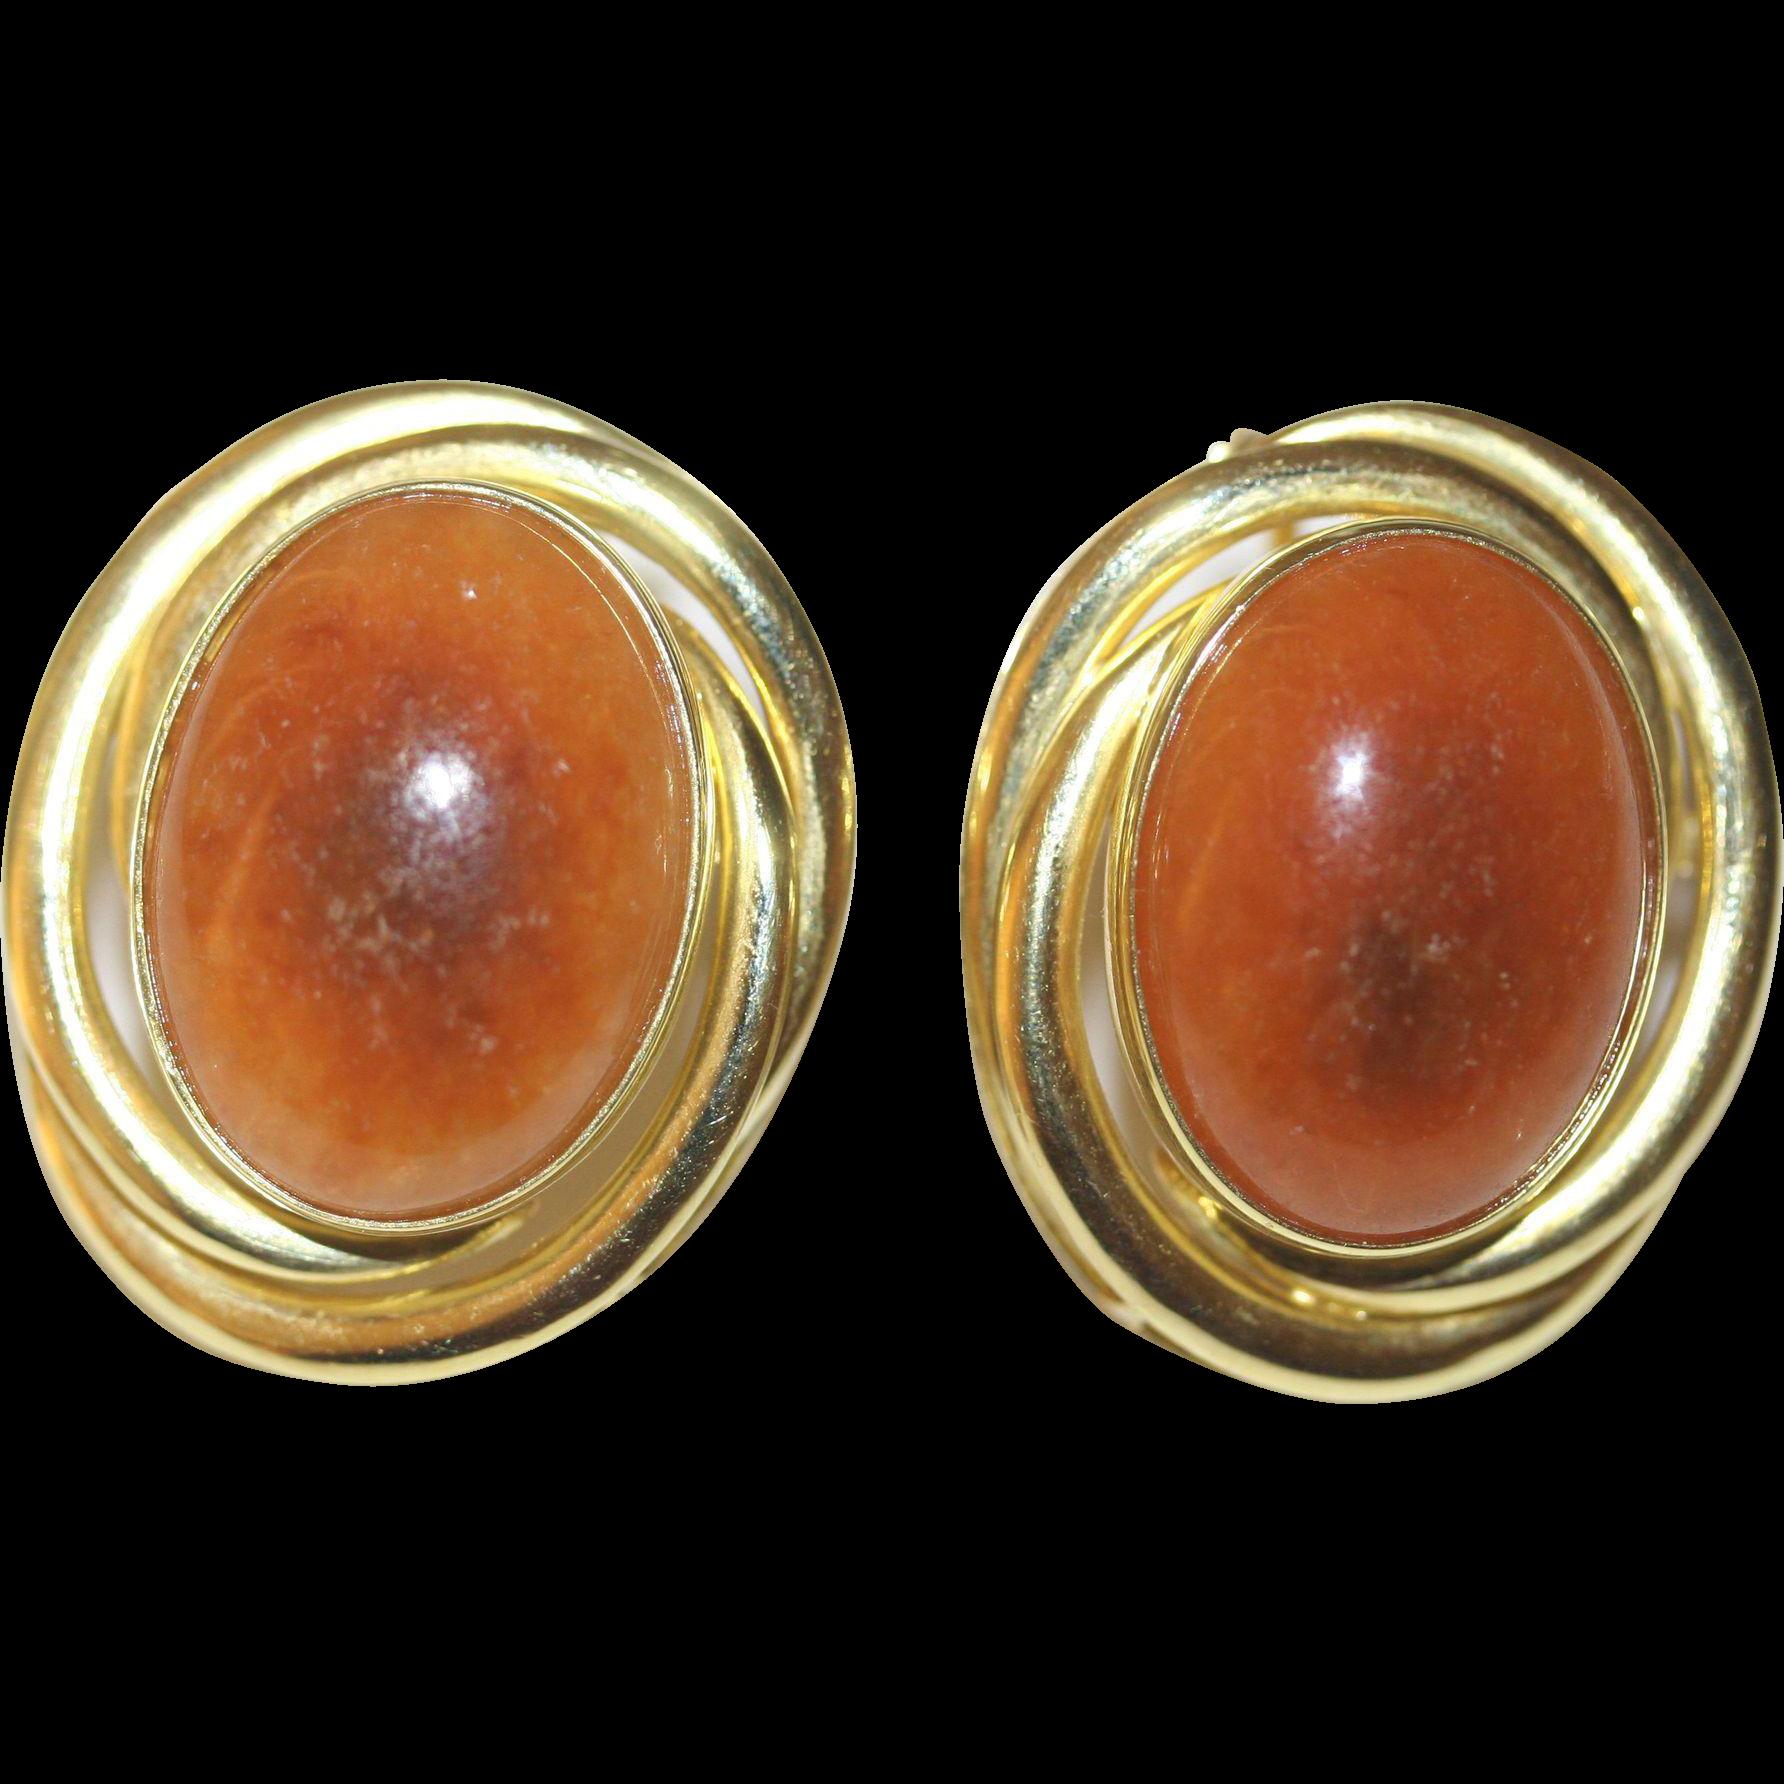 vintage large chinese 14k yellow gold russet orange red brown jadeite jade earrings with posts 276 grams